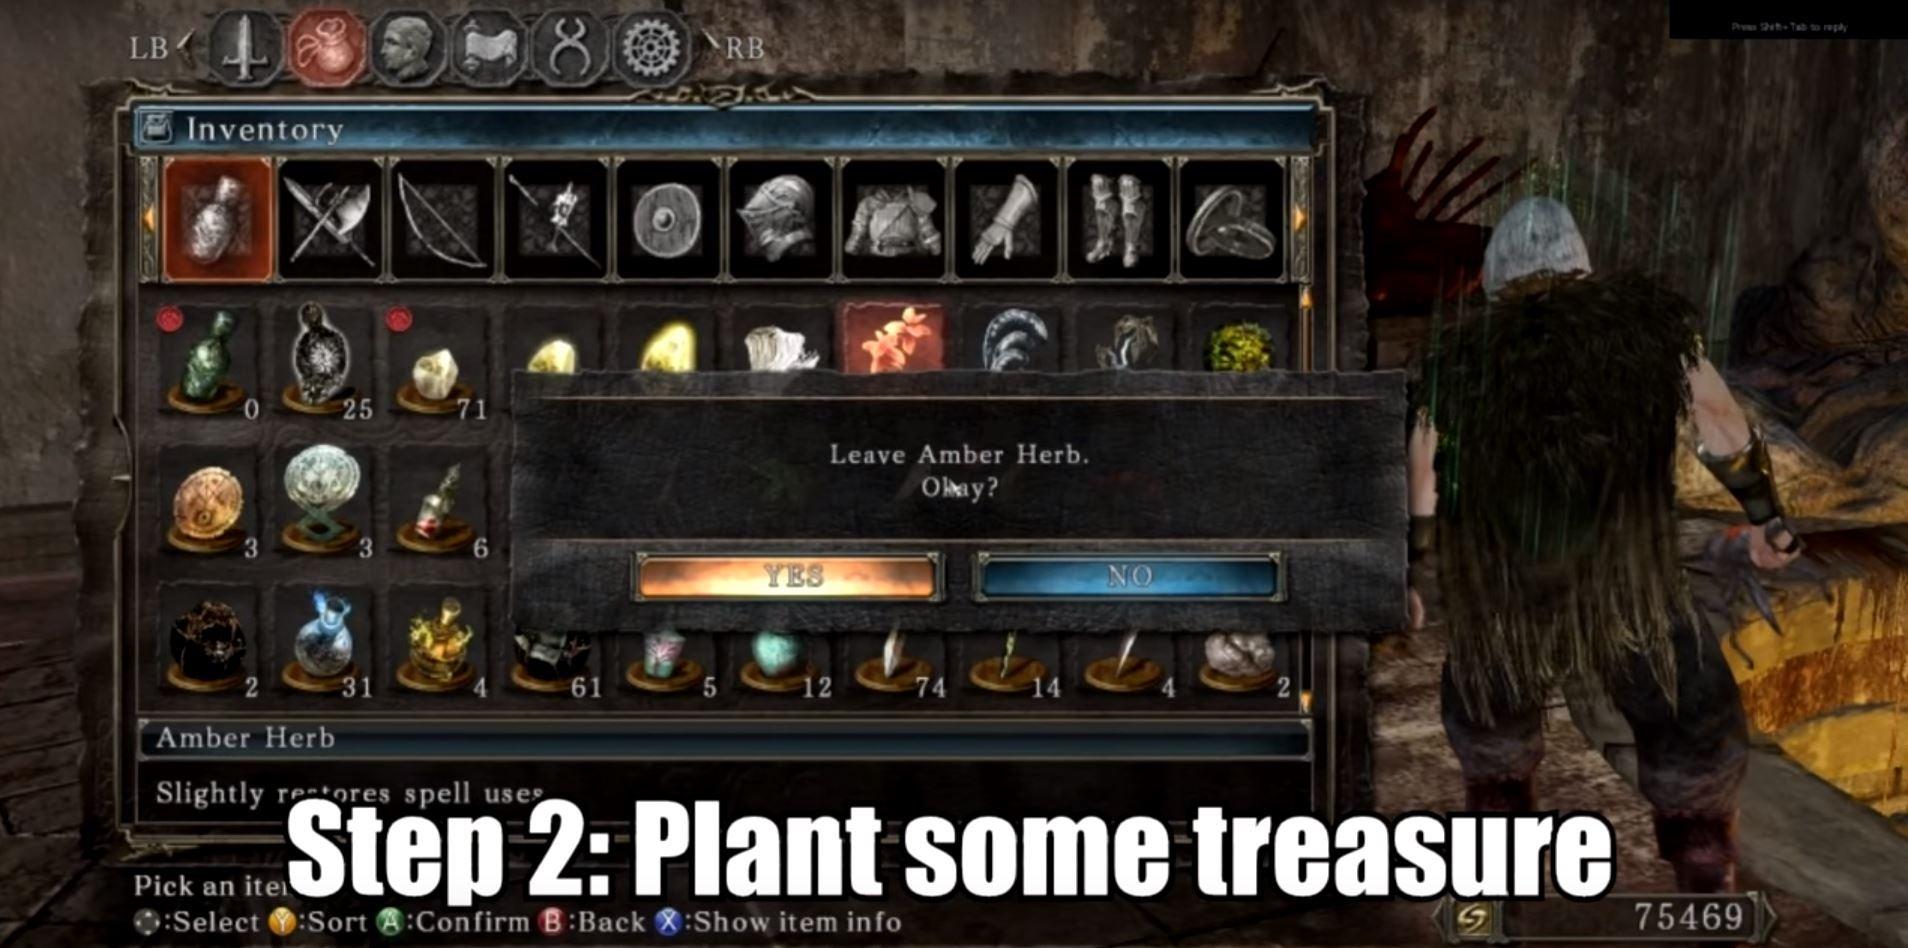 Meet Iron Pineapple, The Biggest Troll In Dark Souls